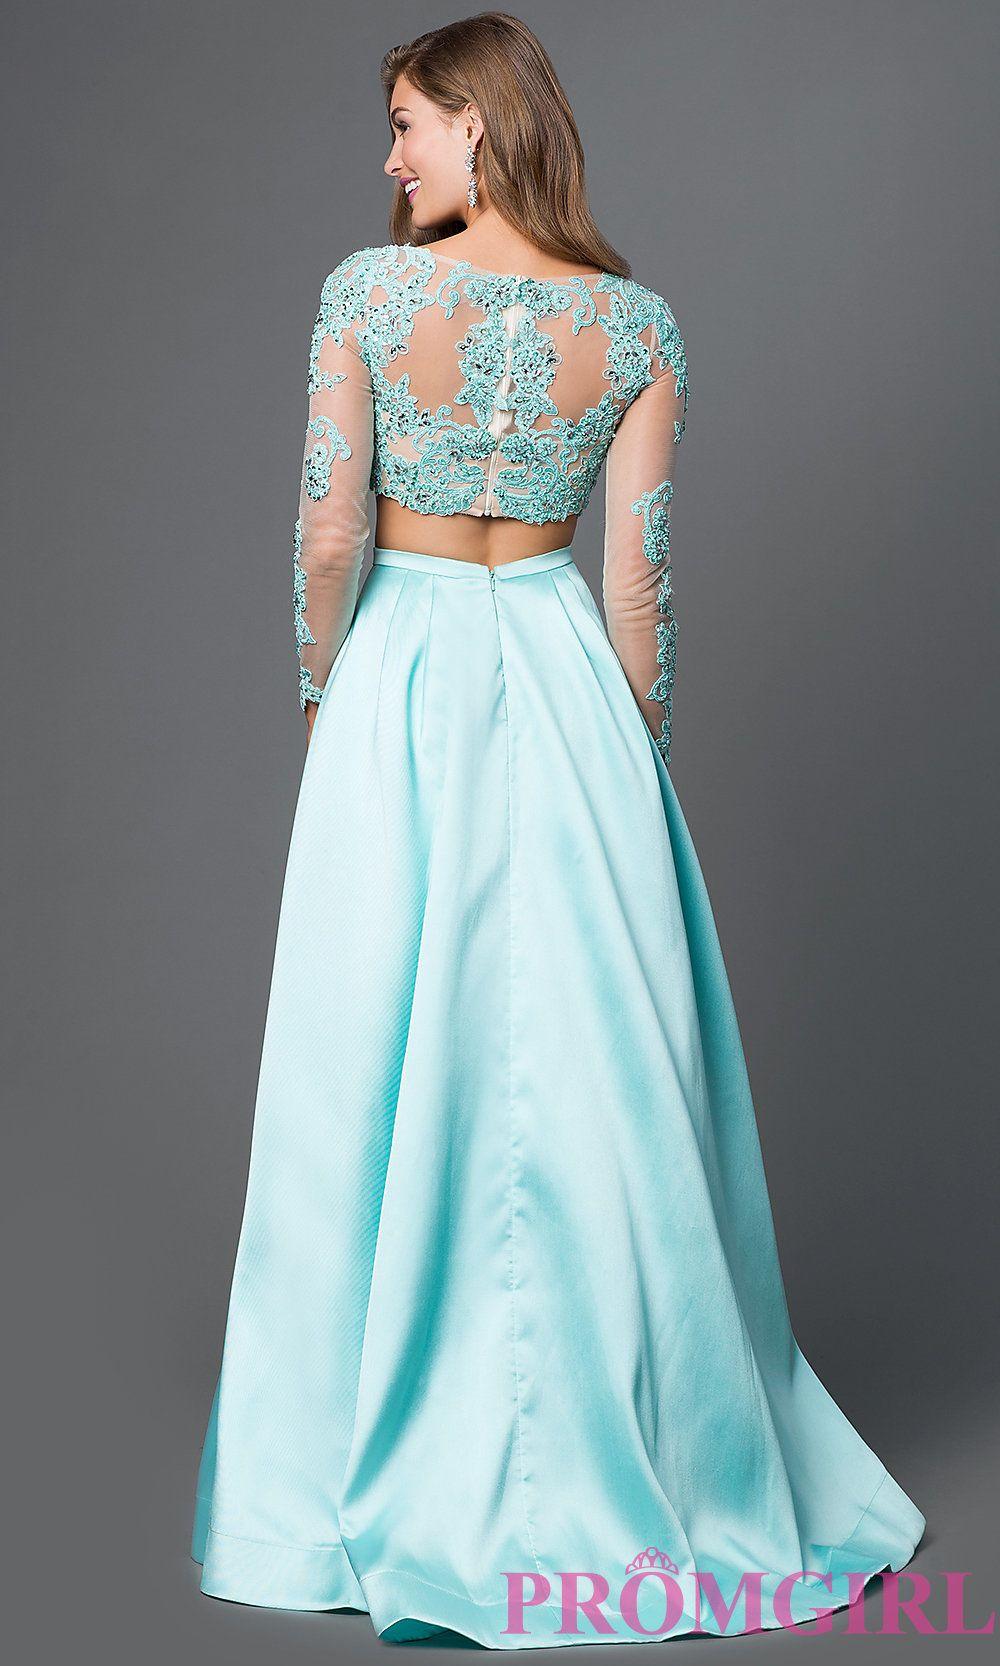 Long Sleeve Sherri Hill Two Piece Dress in Aqua | All Dressed Up ...